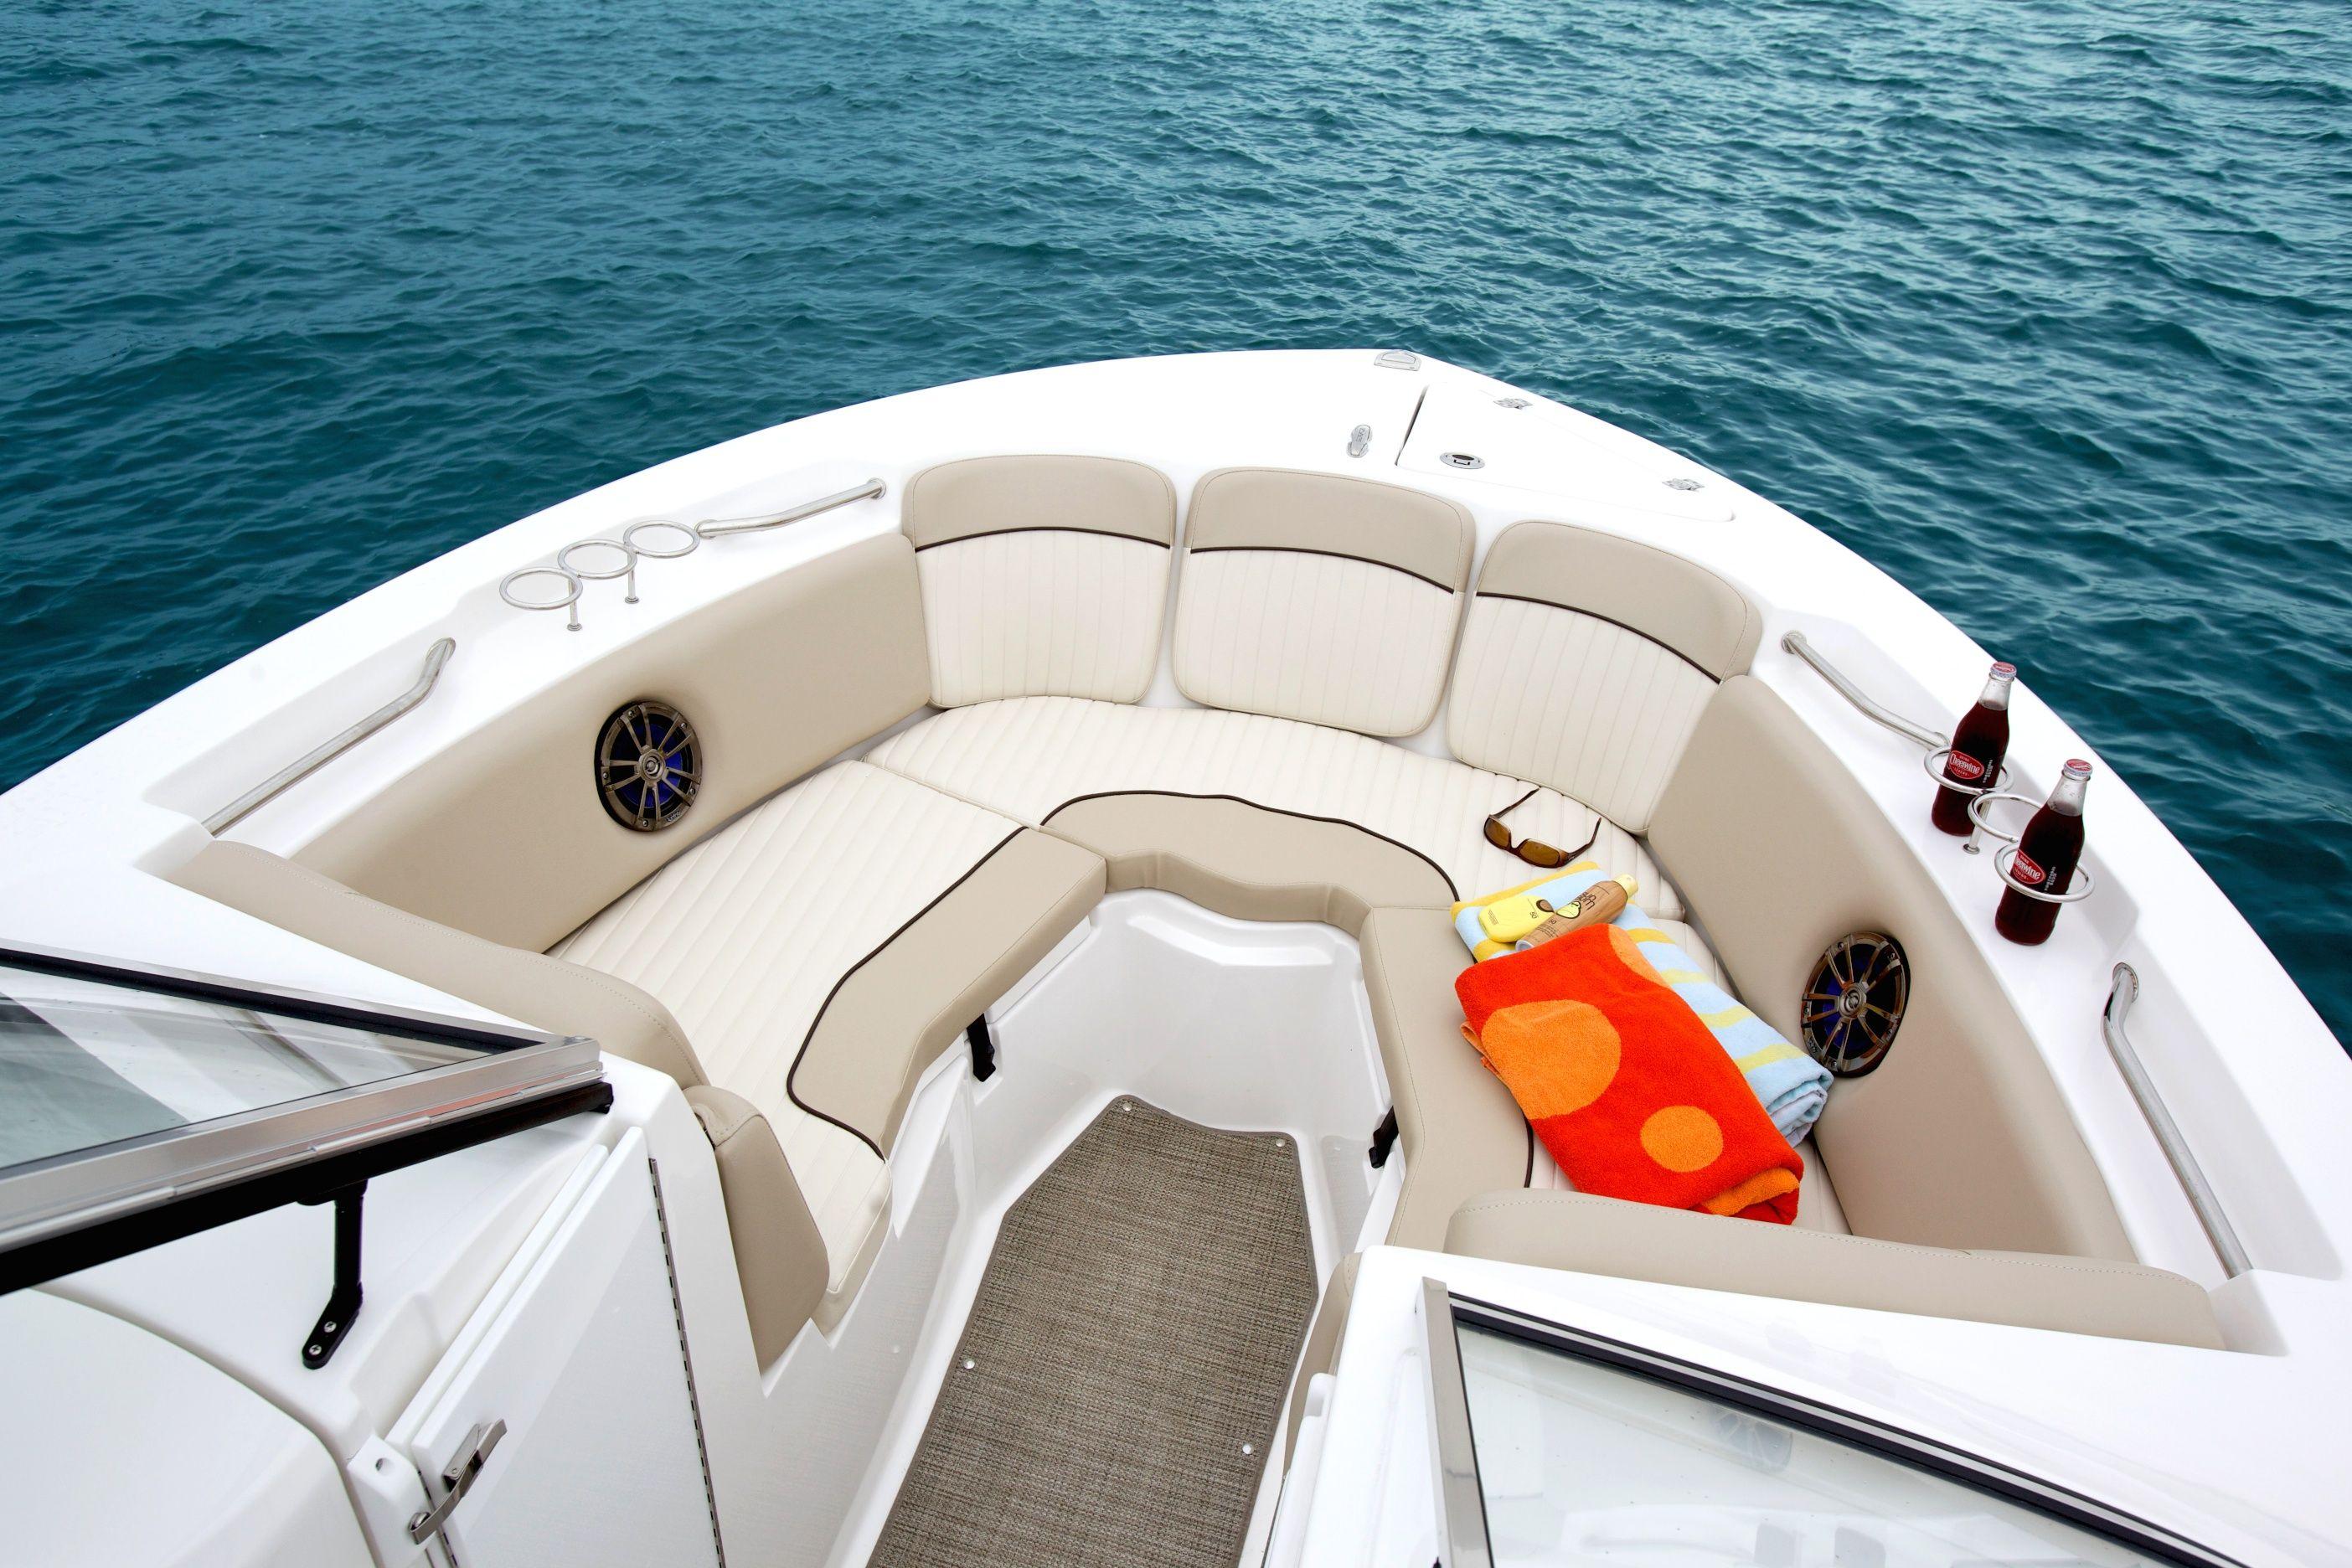 Sea Fox 226 Traveler Dual Console Bay Boats Boat Companies Dual